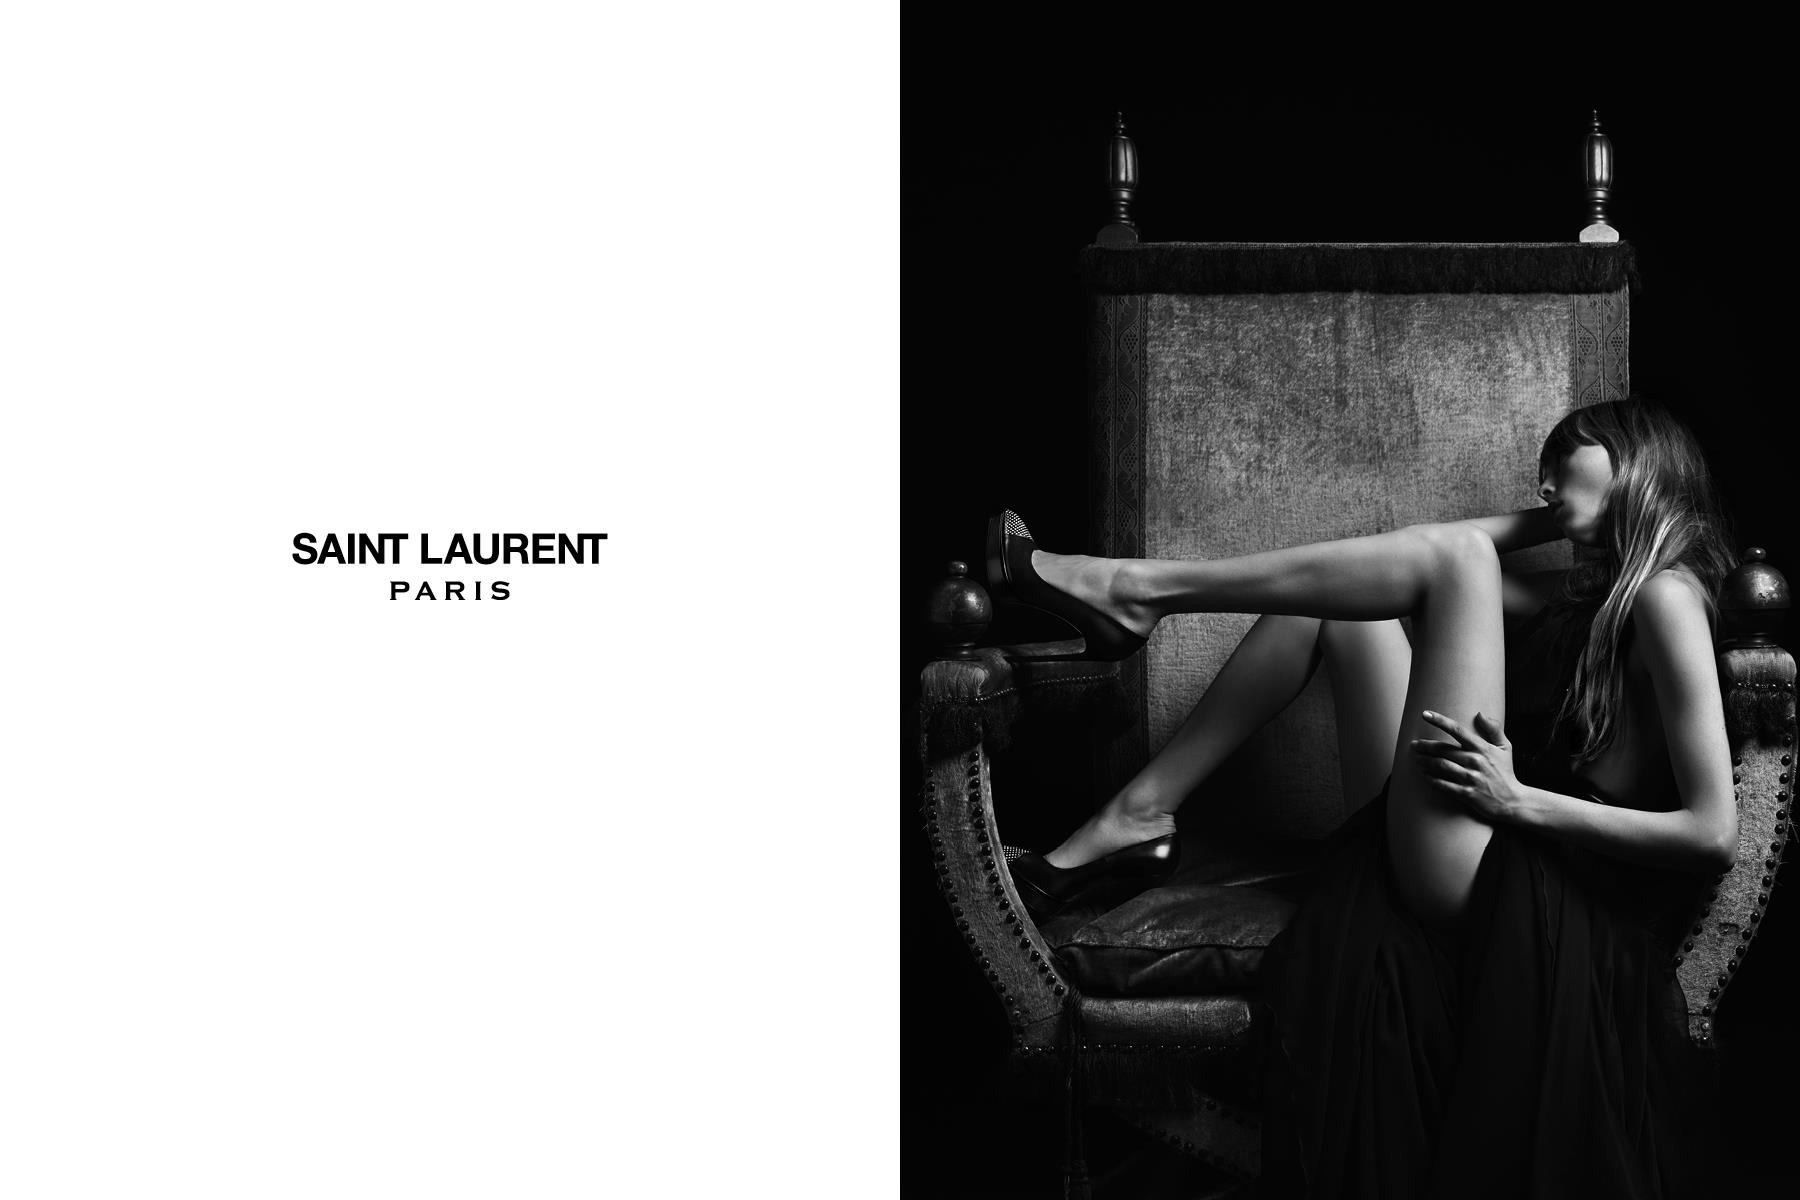 From ysl to saint laurent paris